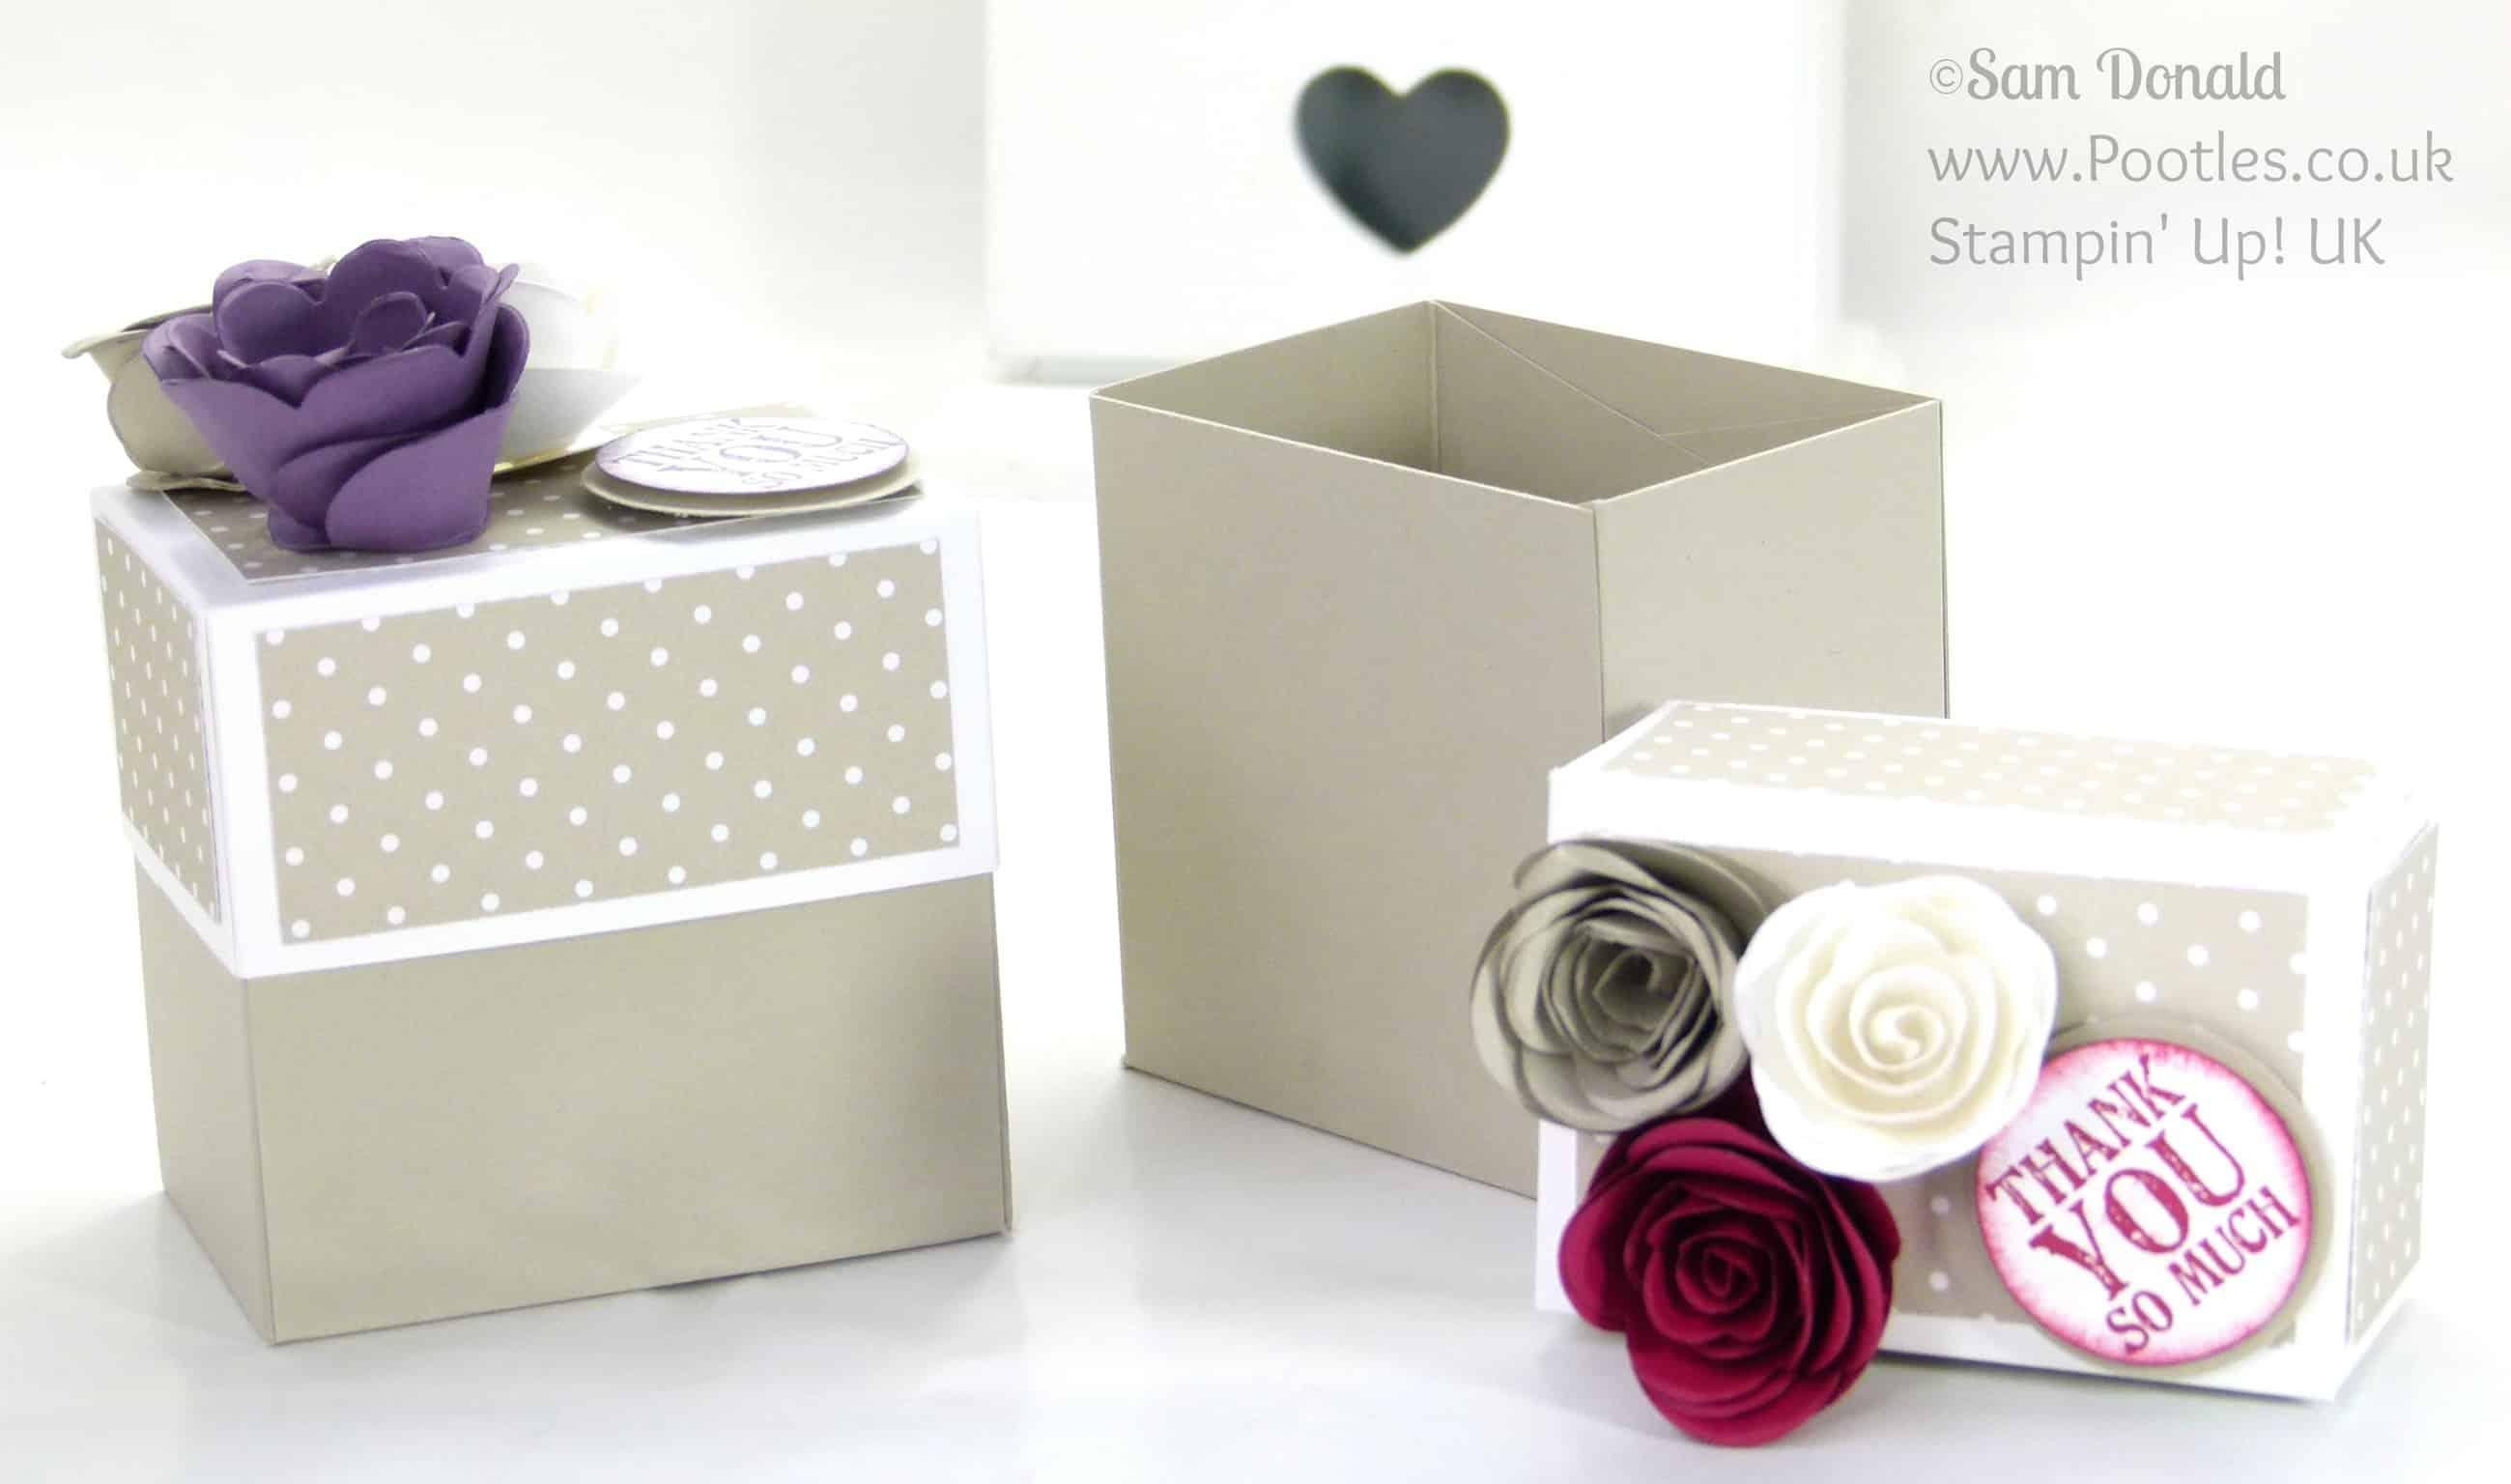 Stampin' Up! UK Demonstrator - Pootles. Rectangular Lidded Box Tutorial with Roses using Stampin' Up! Spiral Flower Die